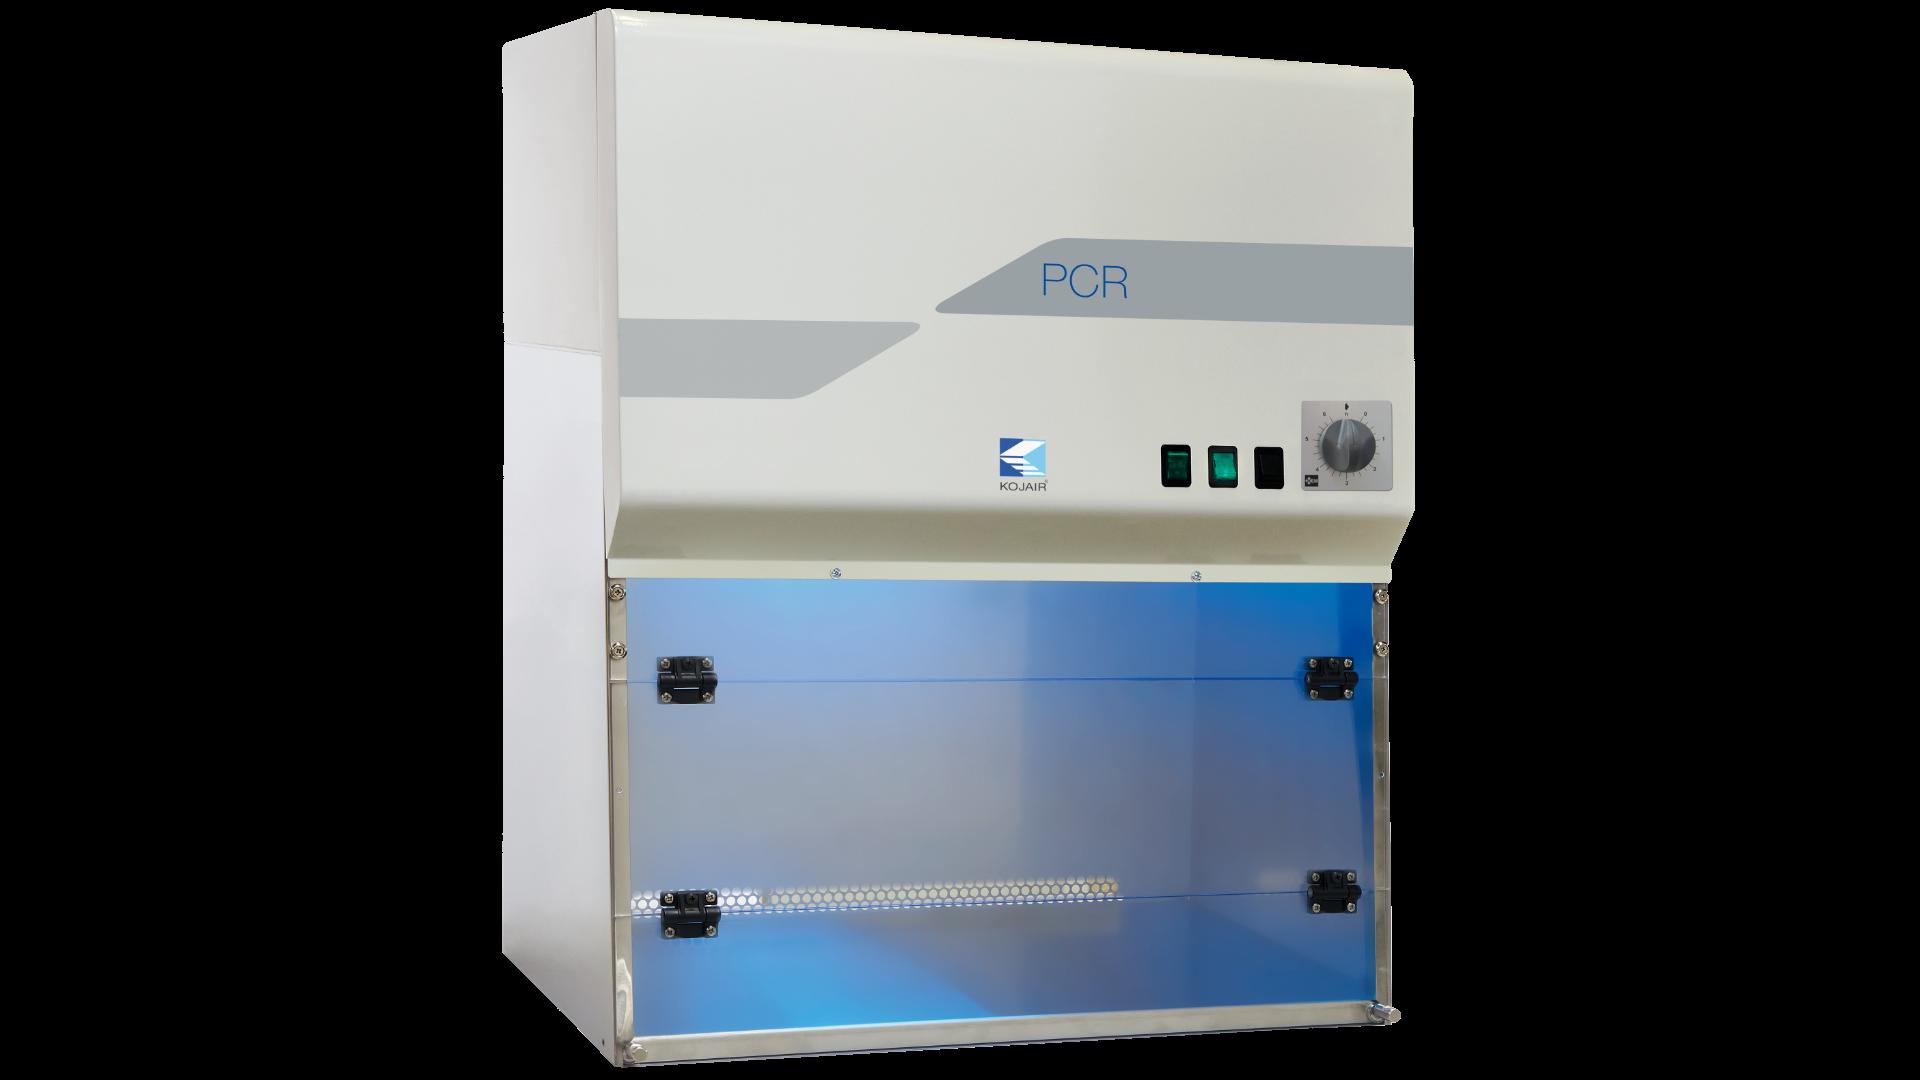 PCR Workstation with UV lights